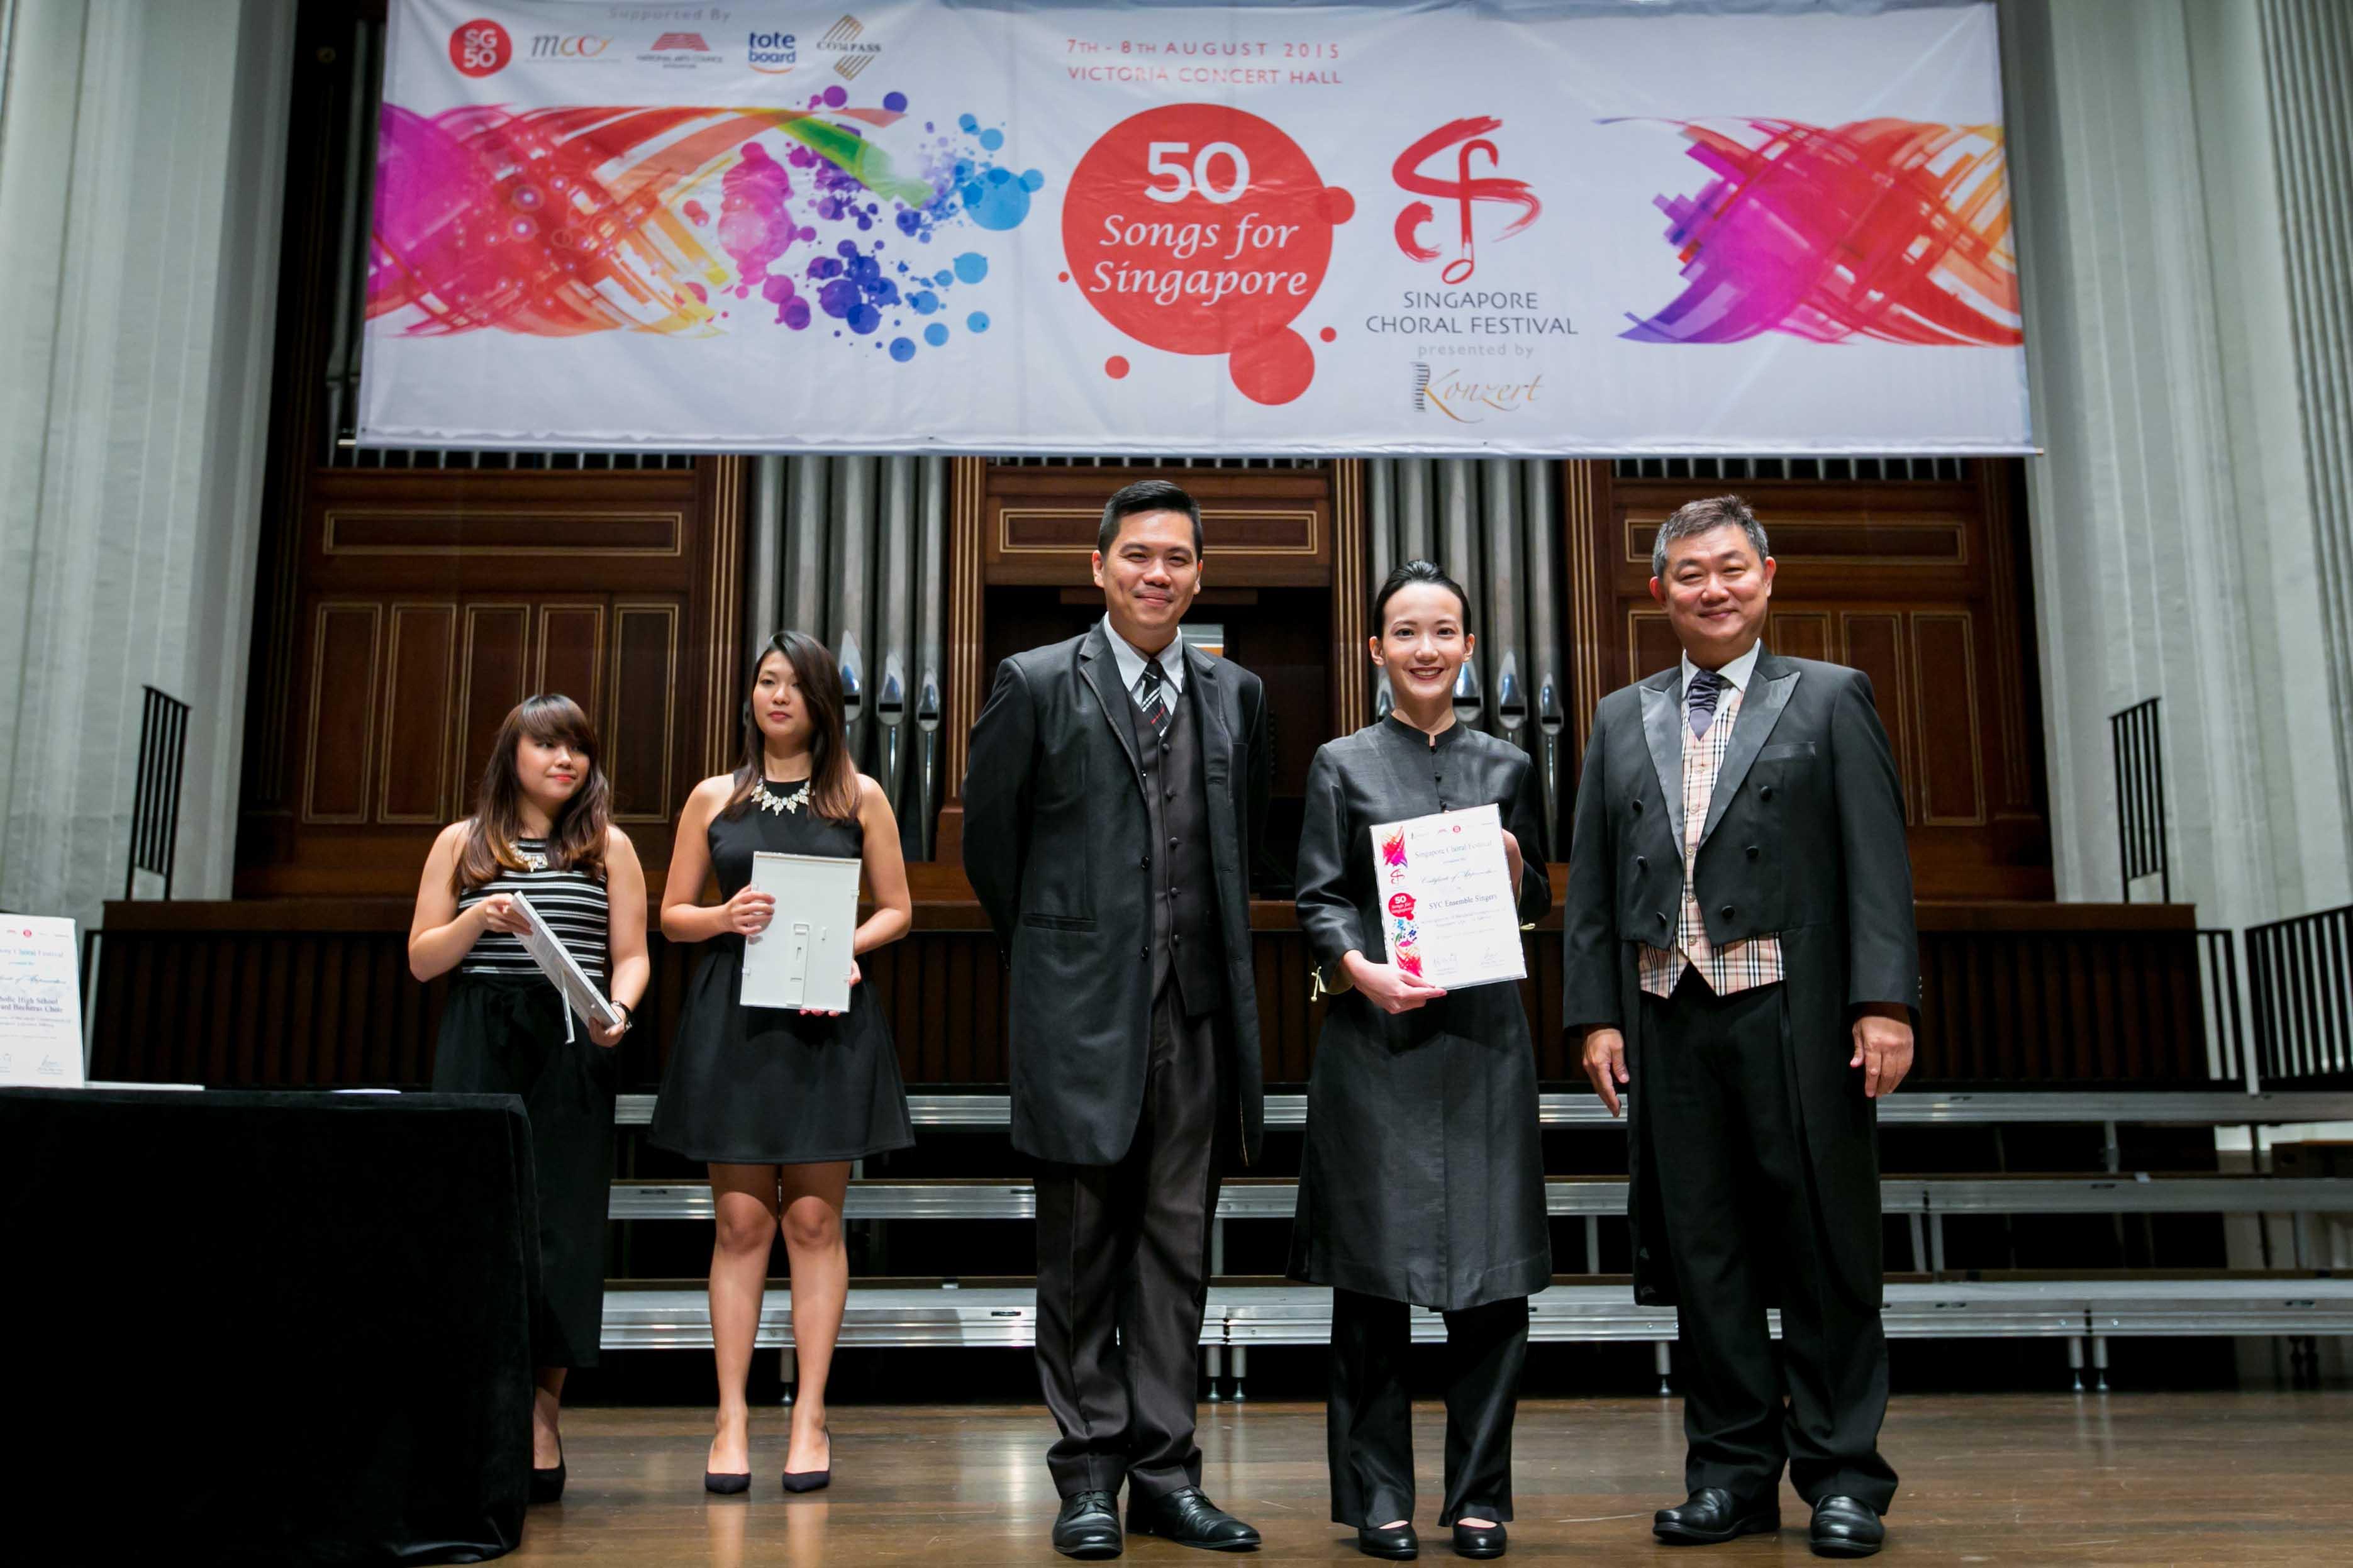 Singapore Choral Festival 8-8-15 (166).jpg